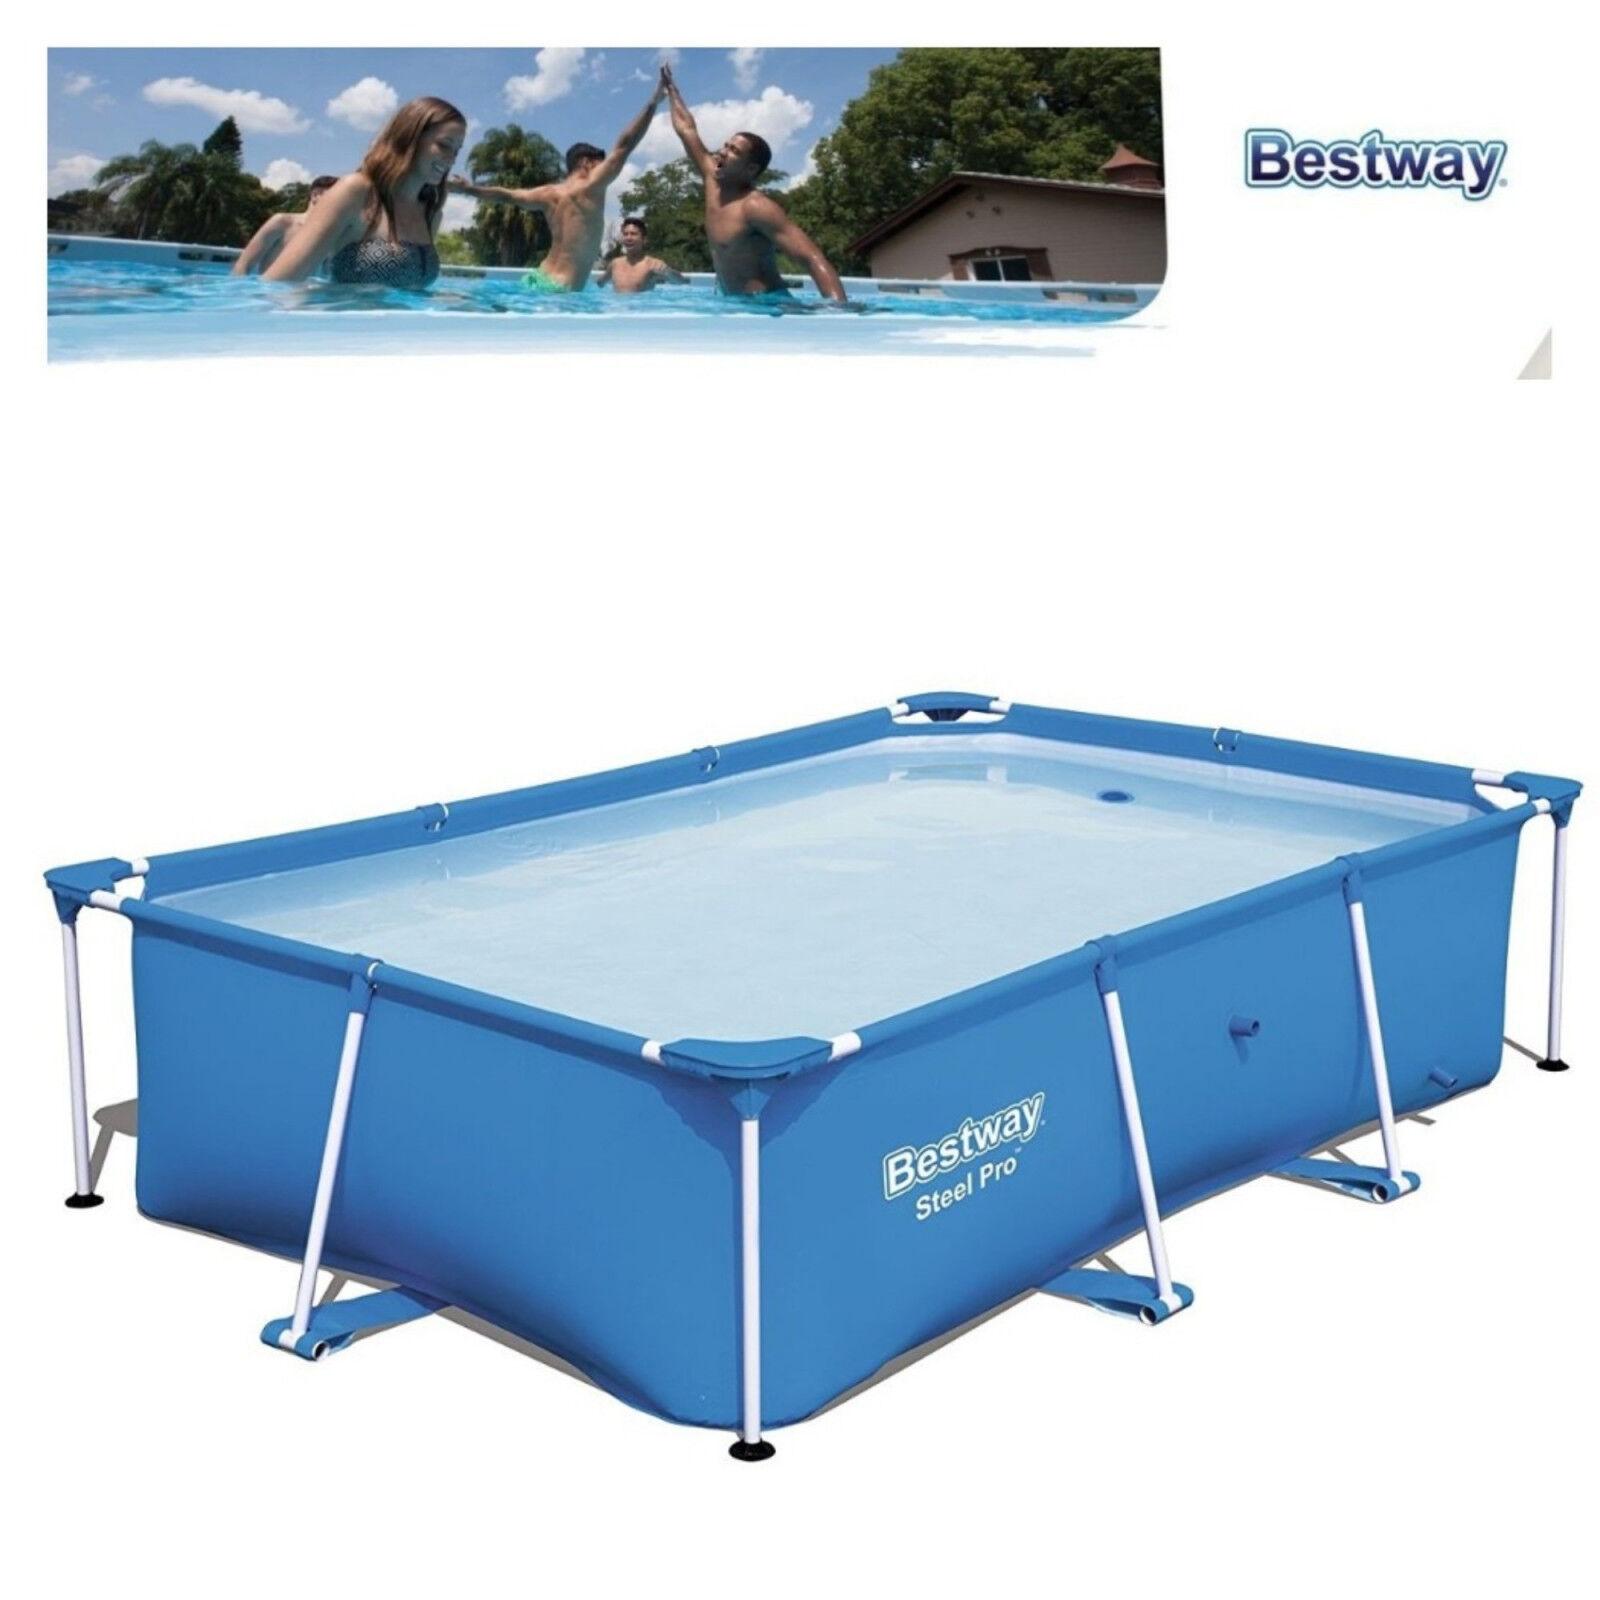 details about intex swimming pool family zinc frame easy set garden pool 3m  x 2m x 0.75m uk